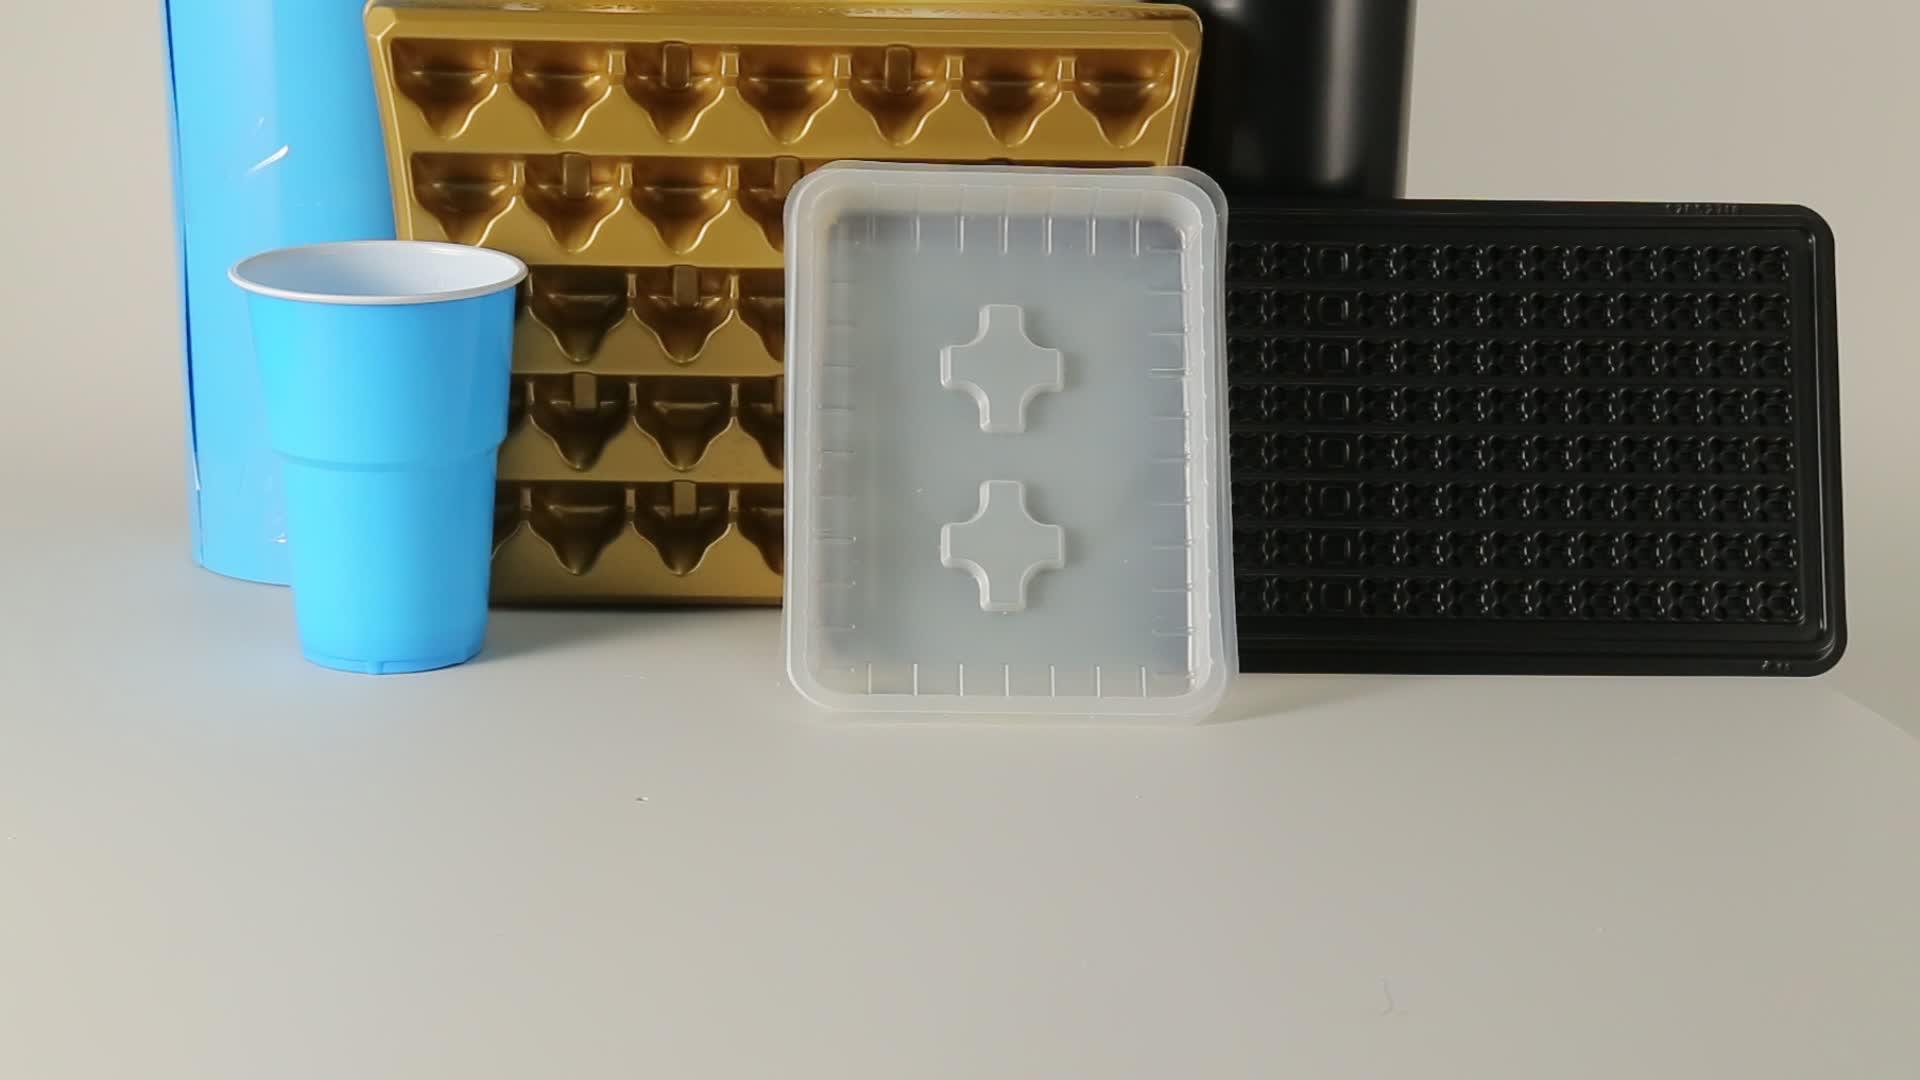 1mm Thick Transparent Flexible Plastic Pp Ps Hips Sheet Roll Buy Pp Sheet Plastic Thick Plastic Roll Transparent Ps Plastic Product On Alibaba Com